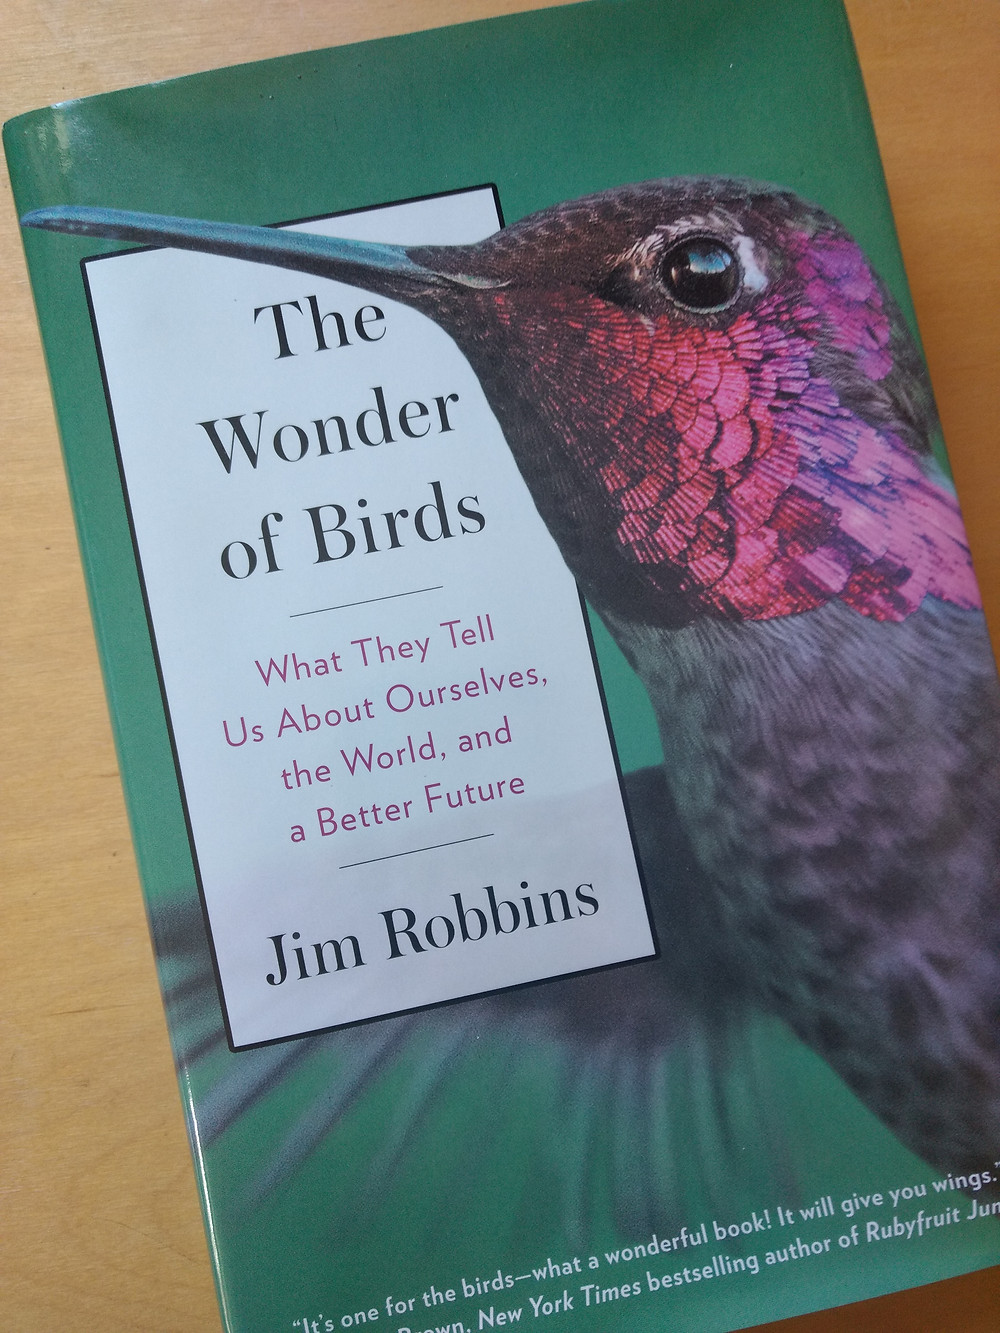 Jim Robbins, The Wonder of Birds